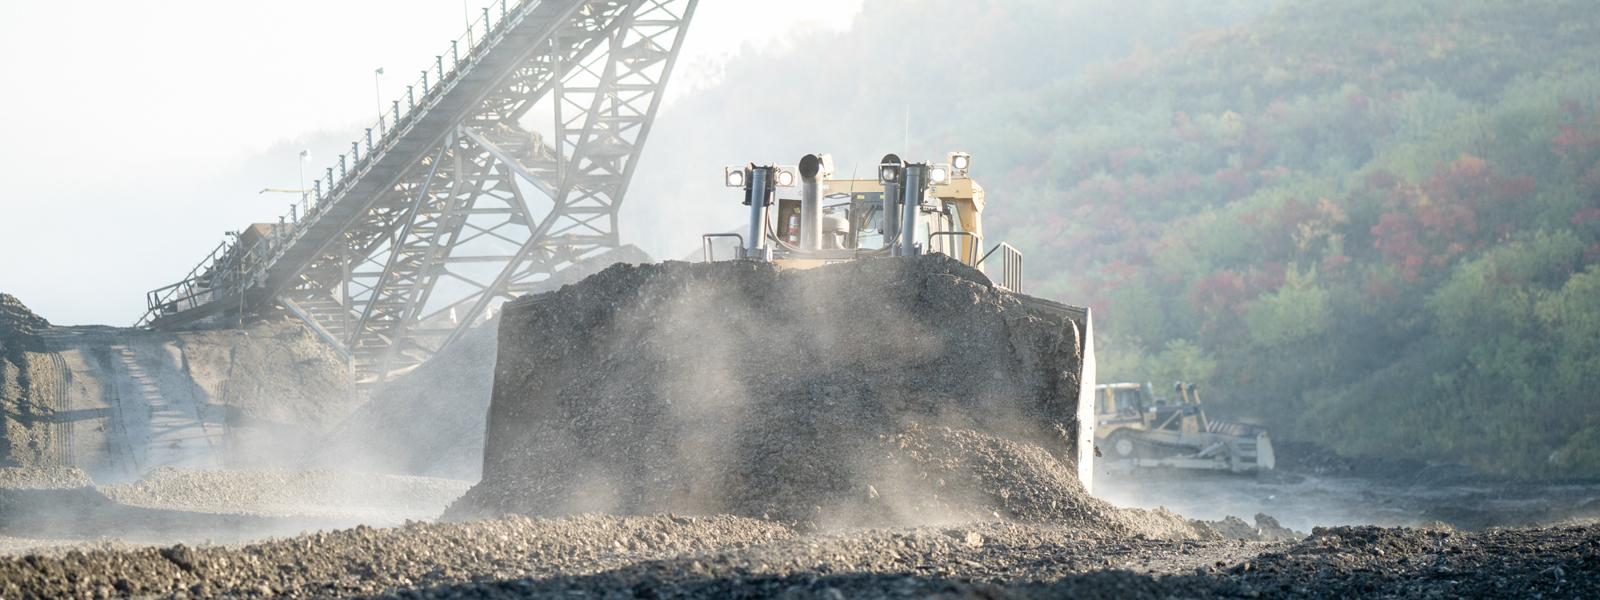 Bulldozer Moving Dirt At Mining/quarry Site